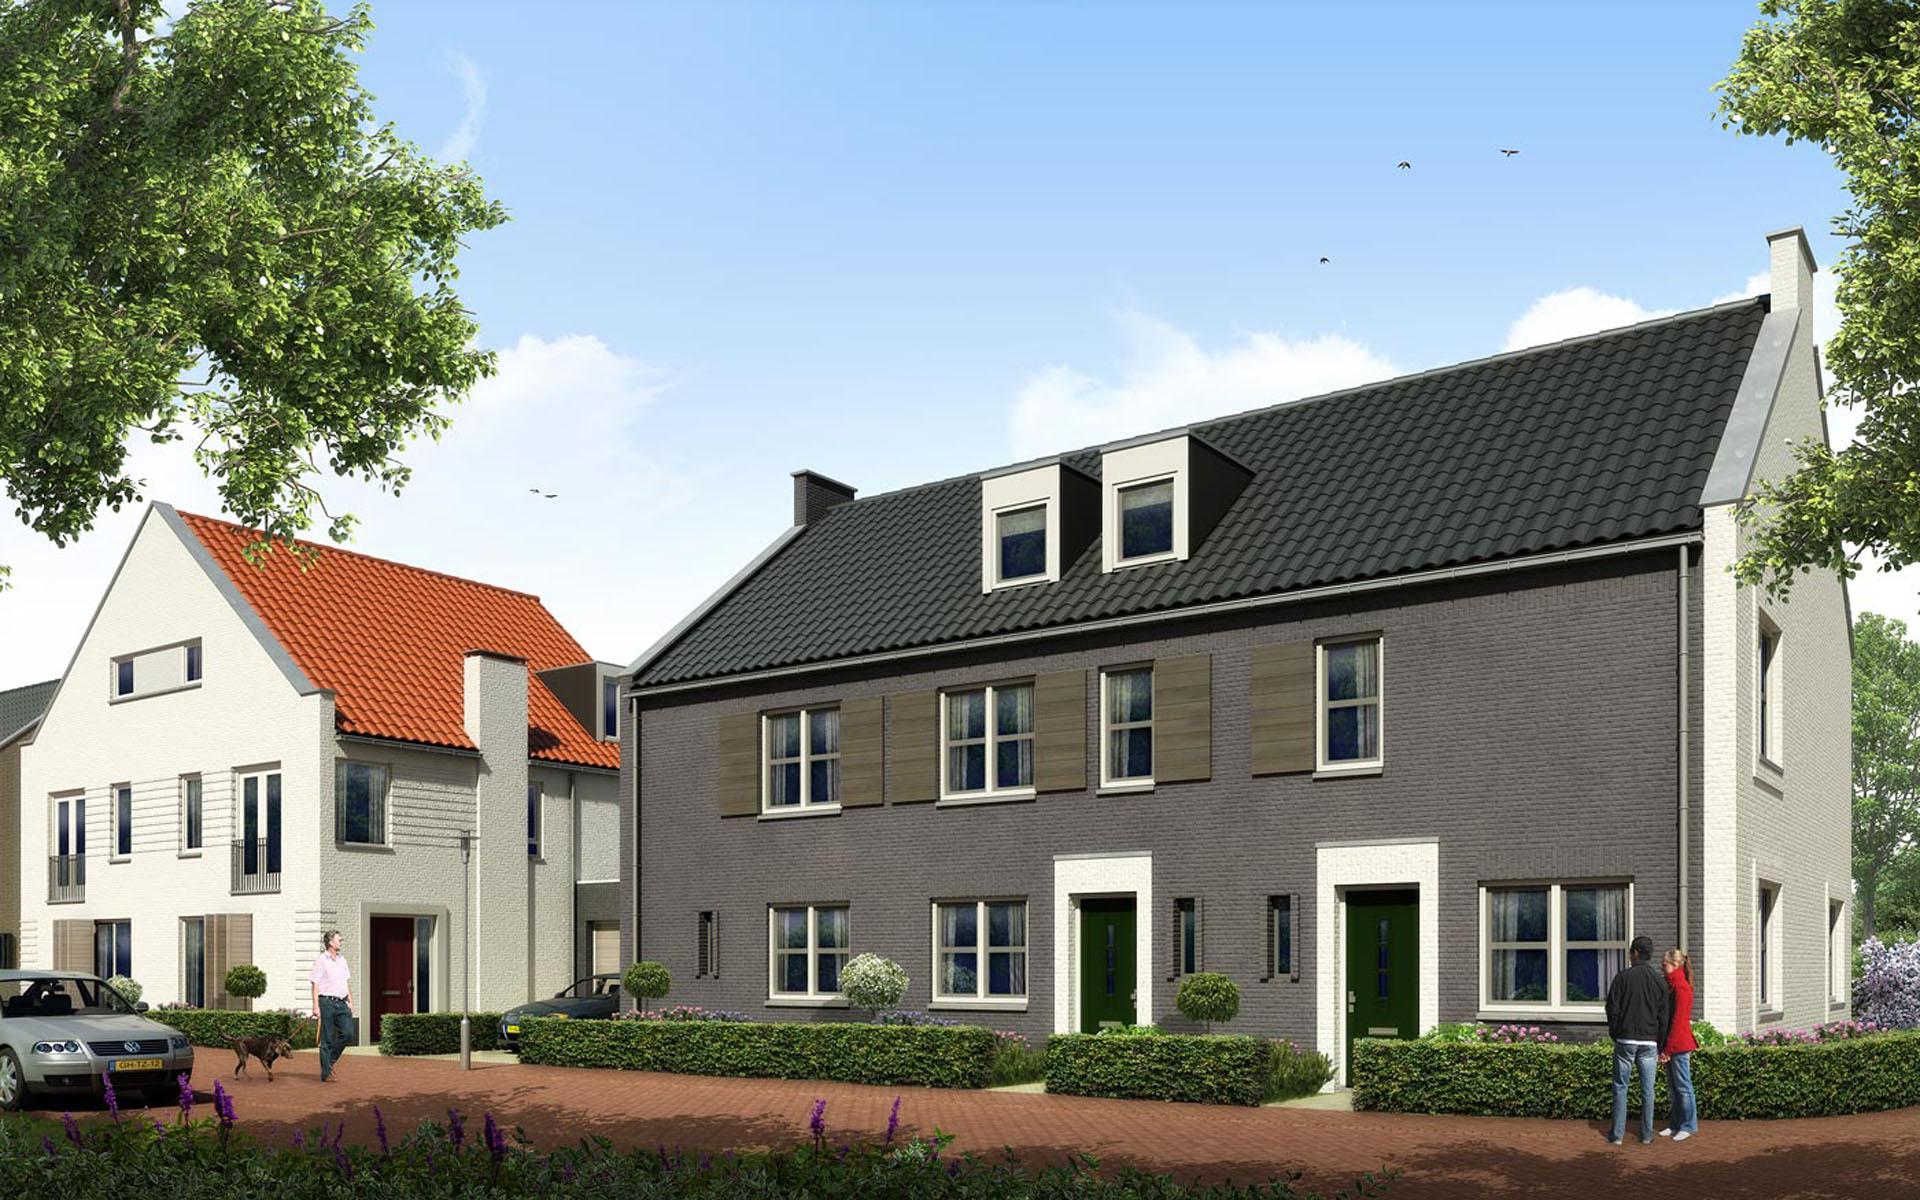 Project Steegsche Velden in Best